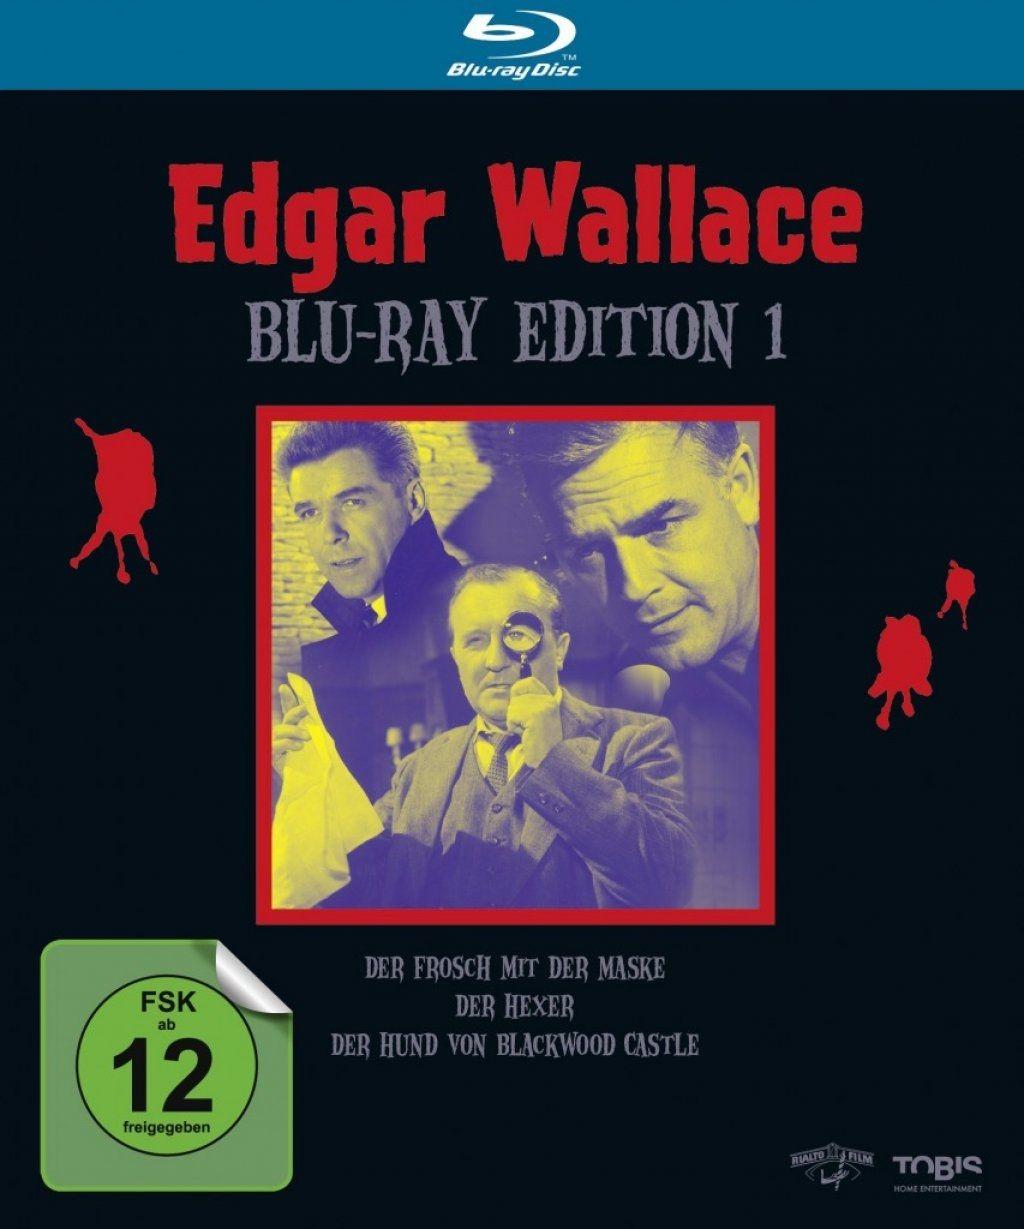 Edgar Wallace - Edition 1 (3 Discs) (BLURAY)